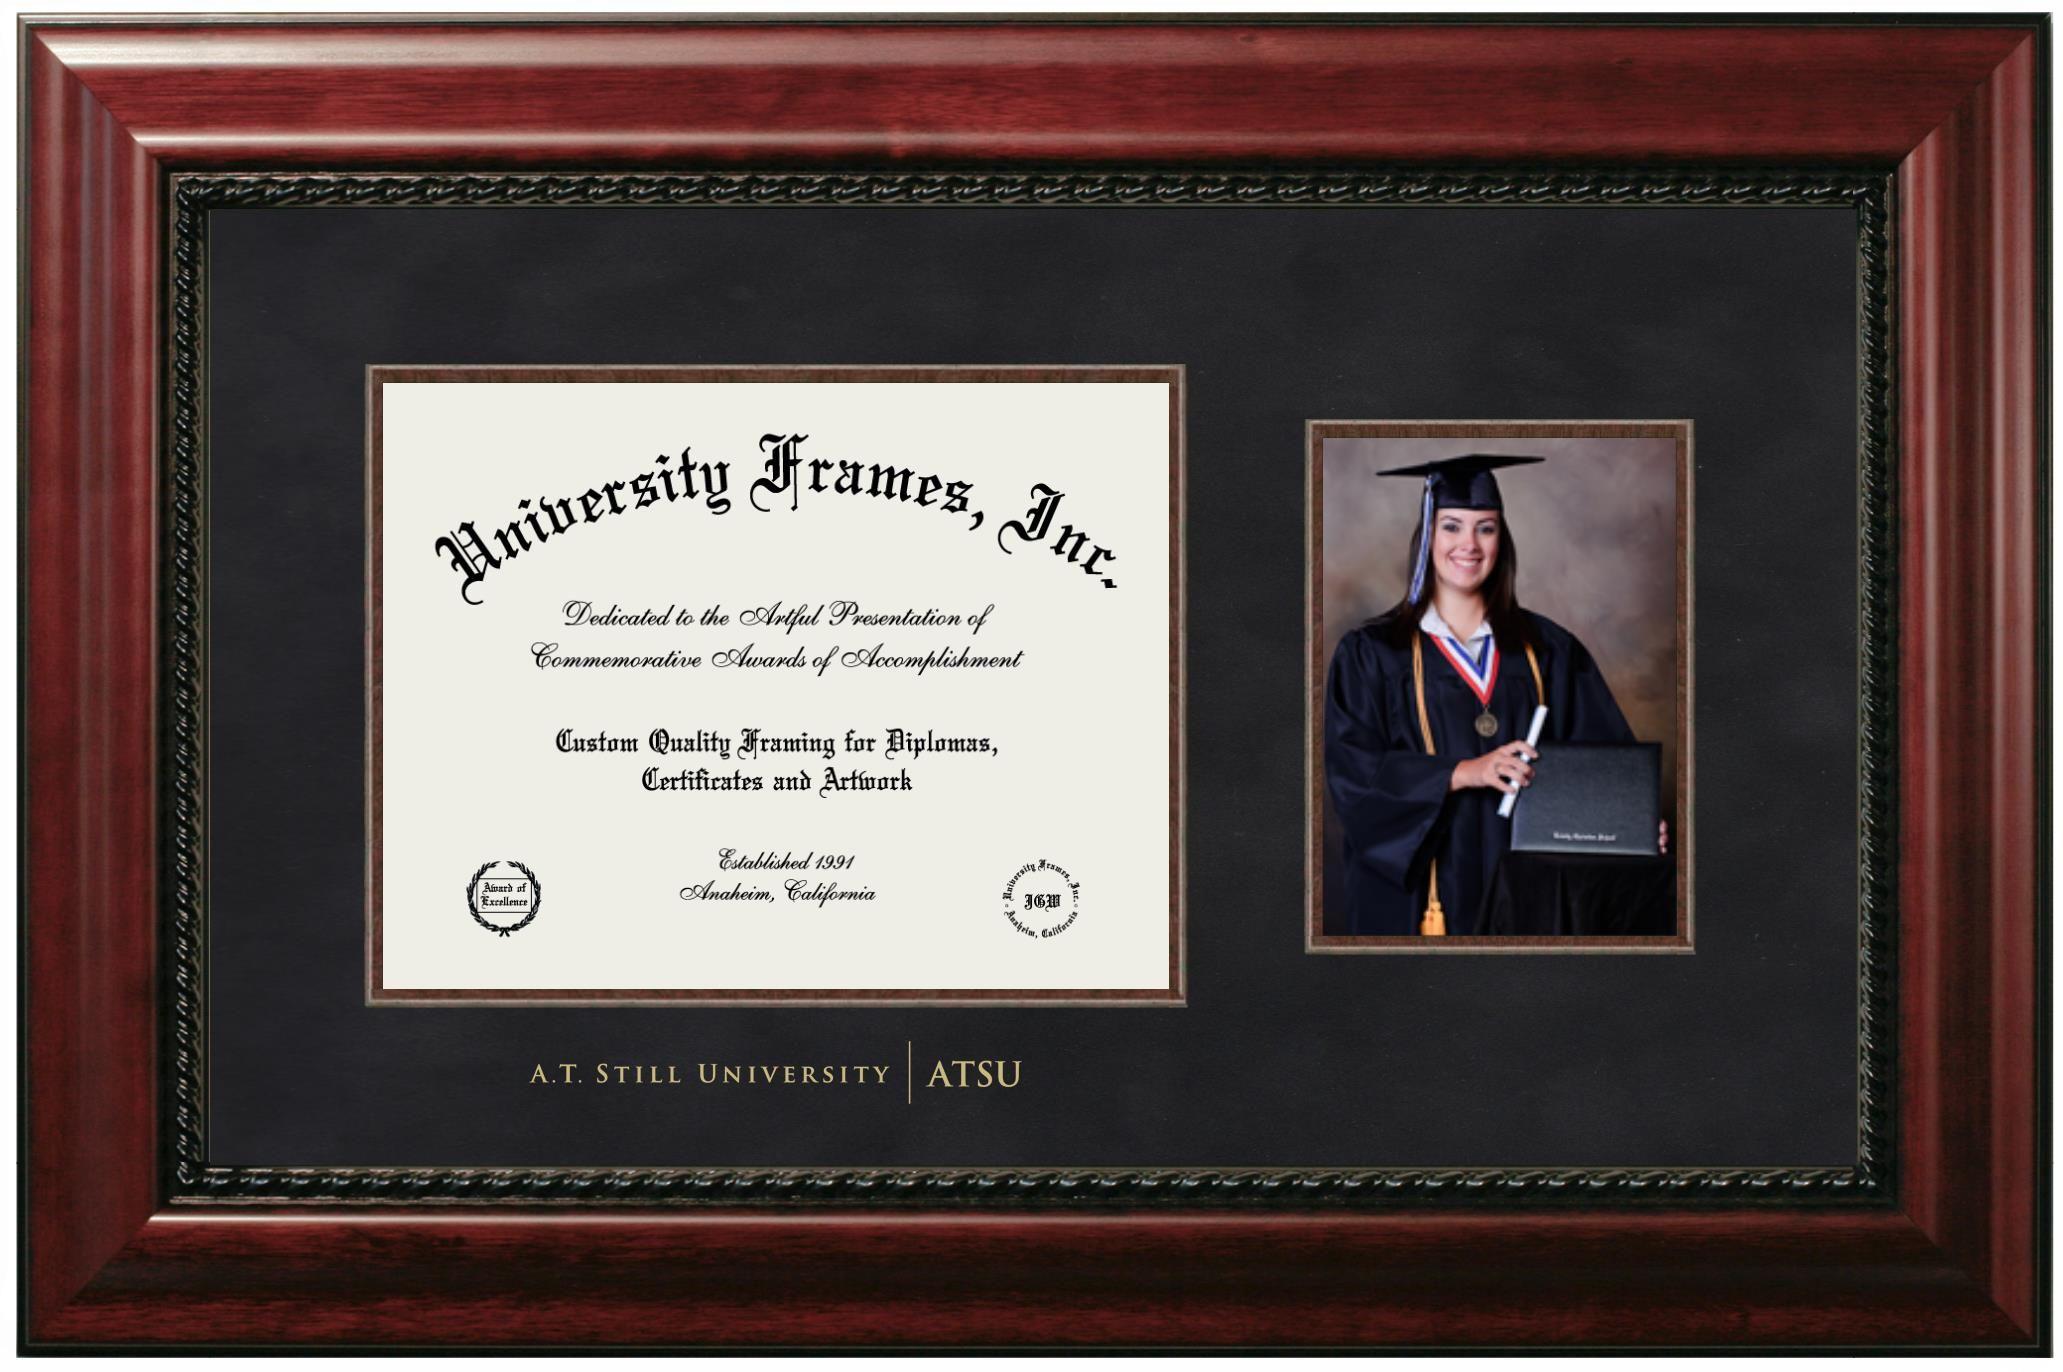 Diploma With 5 X 7 Portrait Frame 405 00 Diploma Frame Frame University Diploma